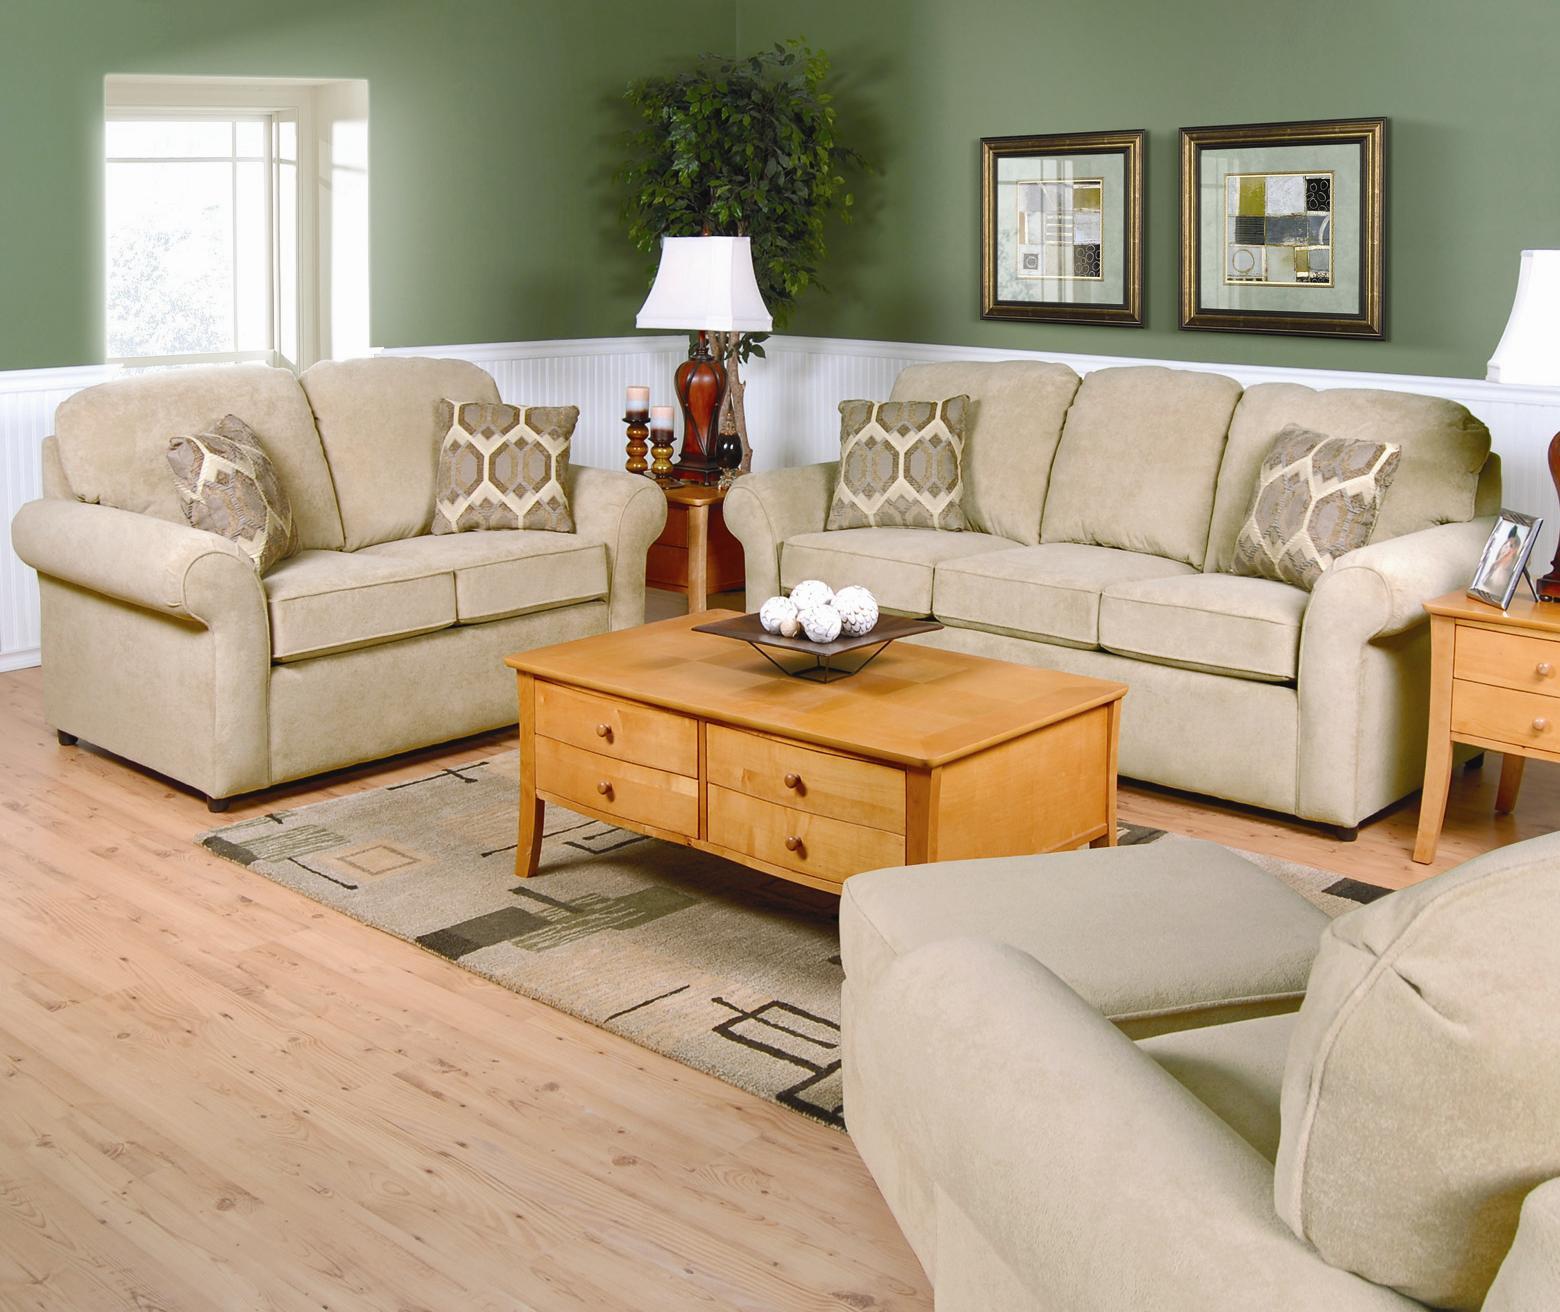 England Malibu 4 5 Seat Corner Sectional Sofa Westrich Furniture